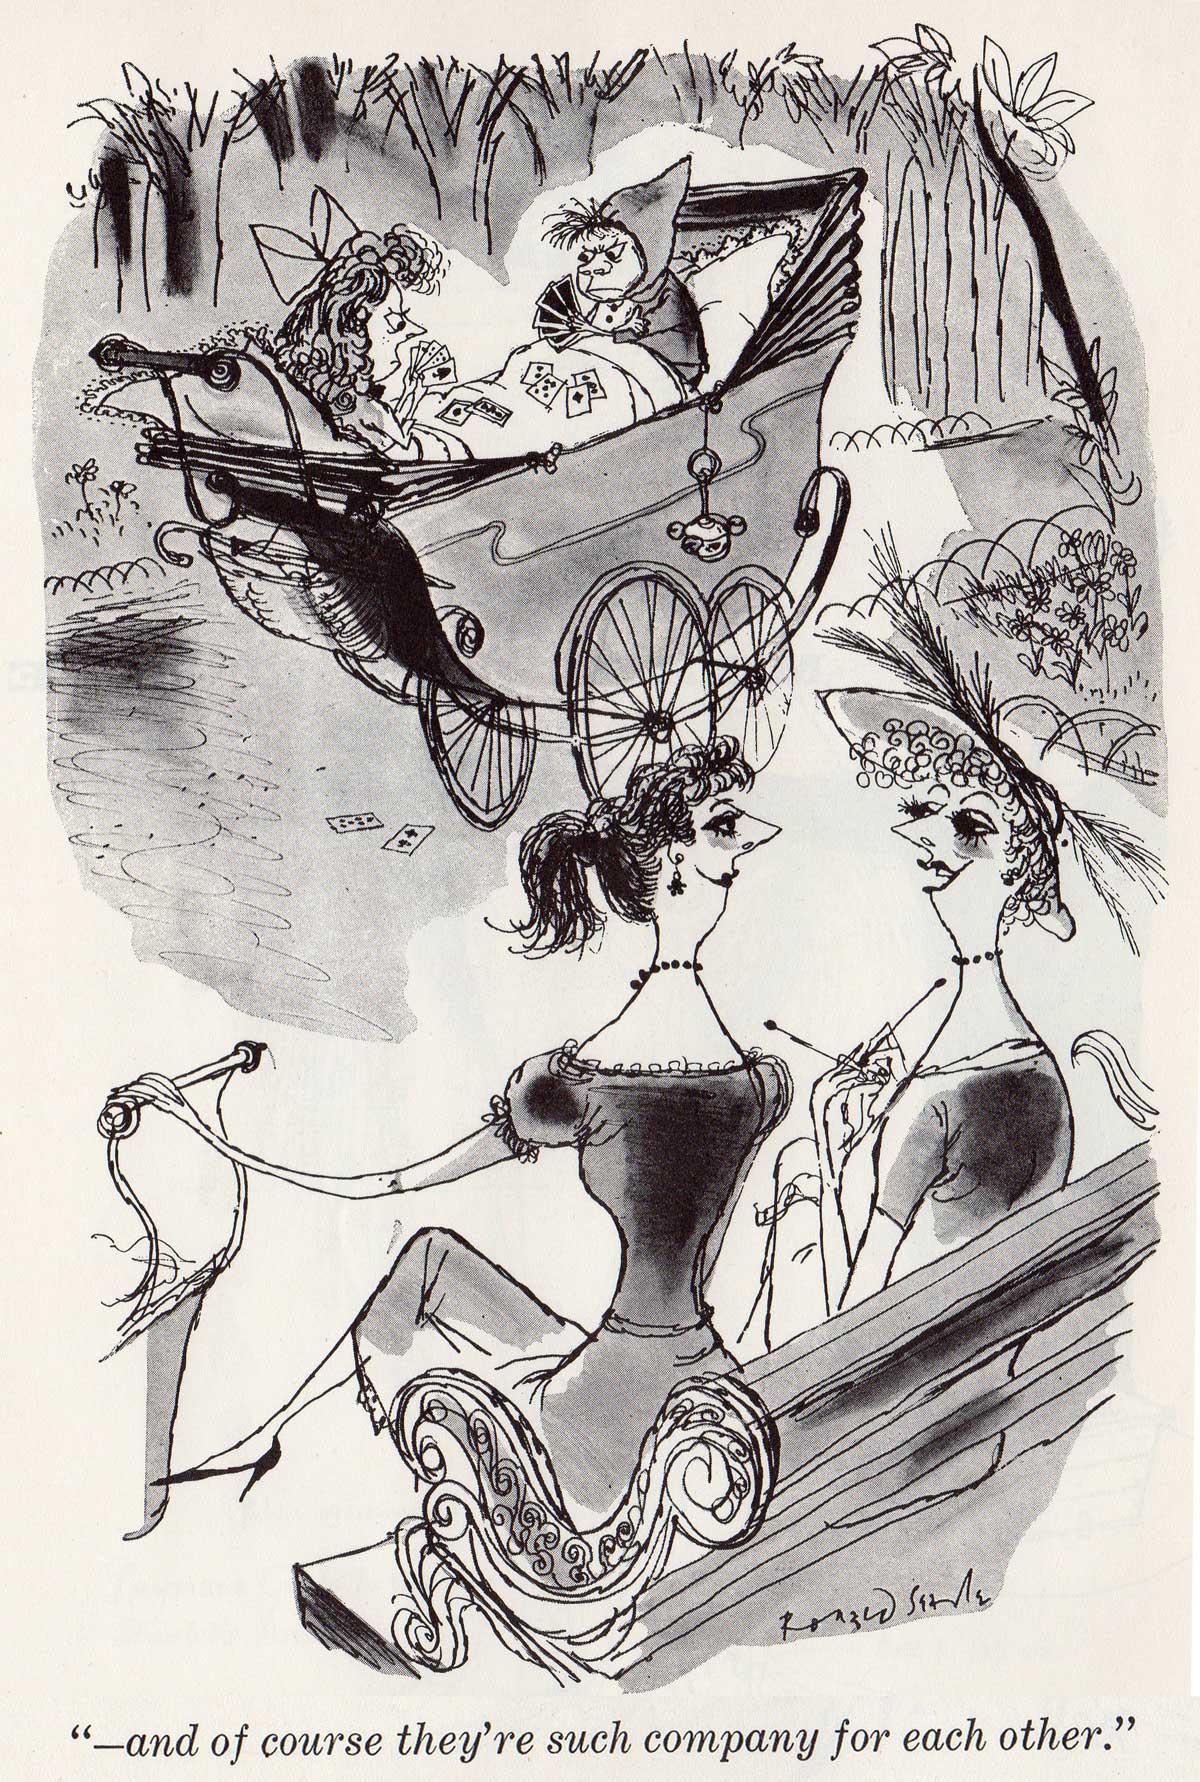 cartoon drawn by Ronald Searle, 1954